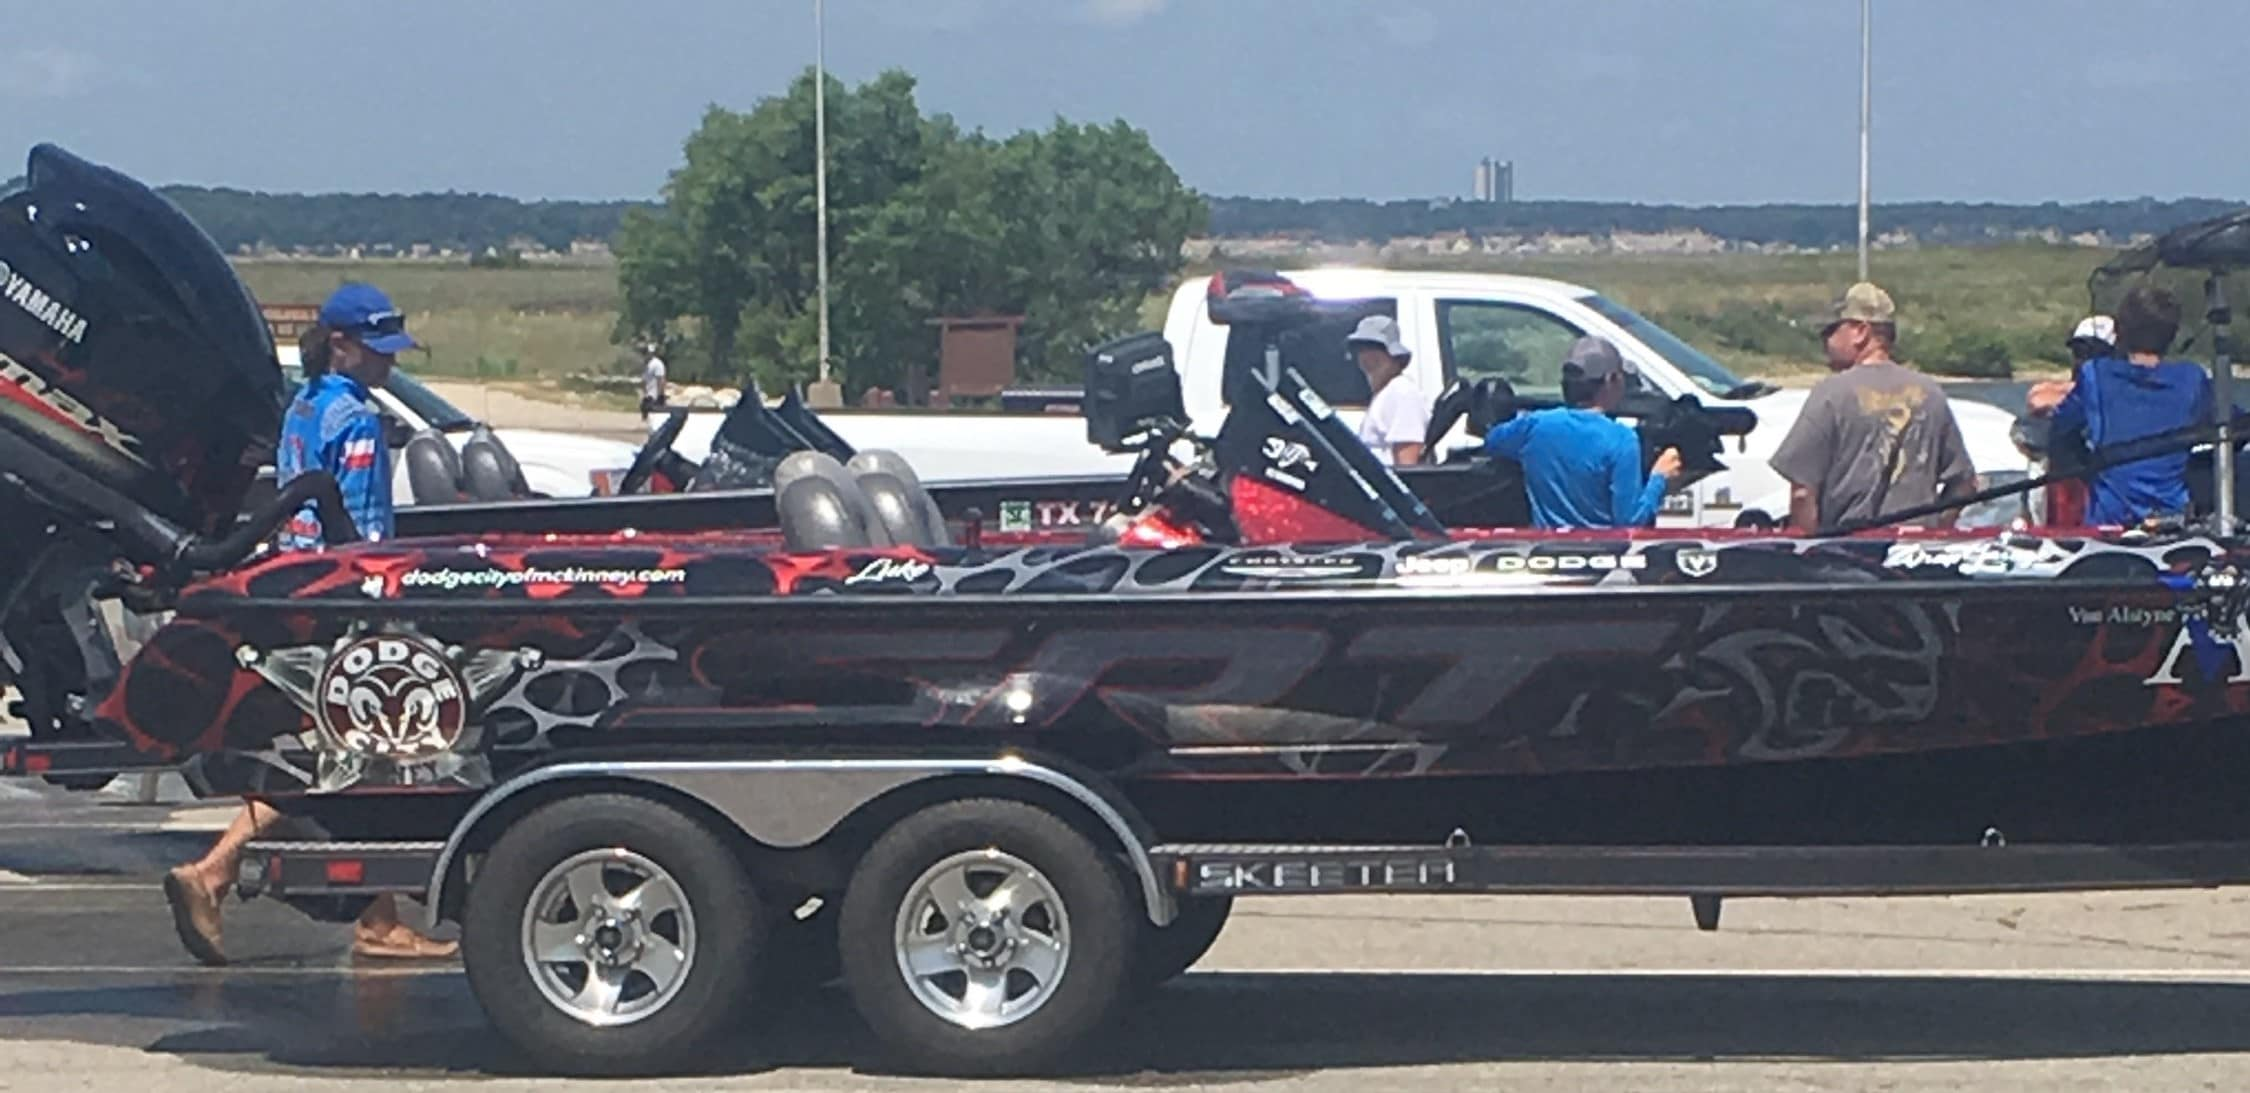 Sponsorship Programs Dodge City of McKinney TX